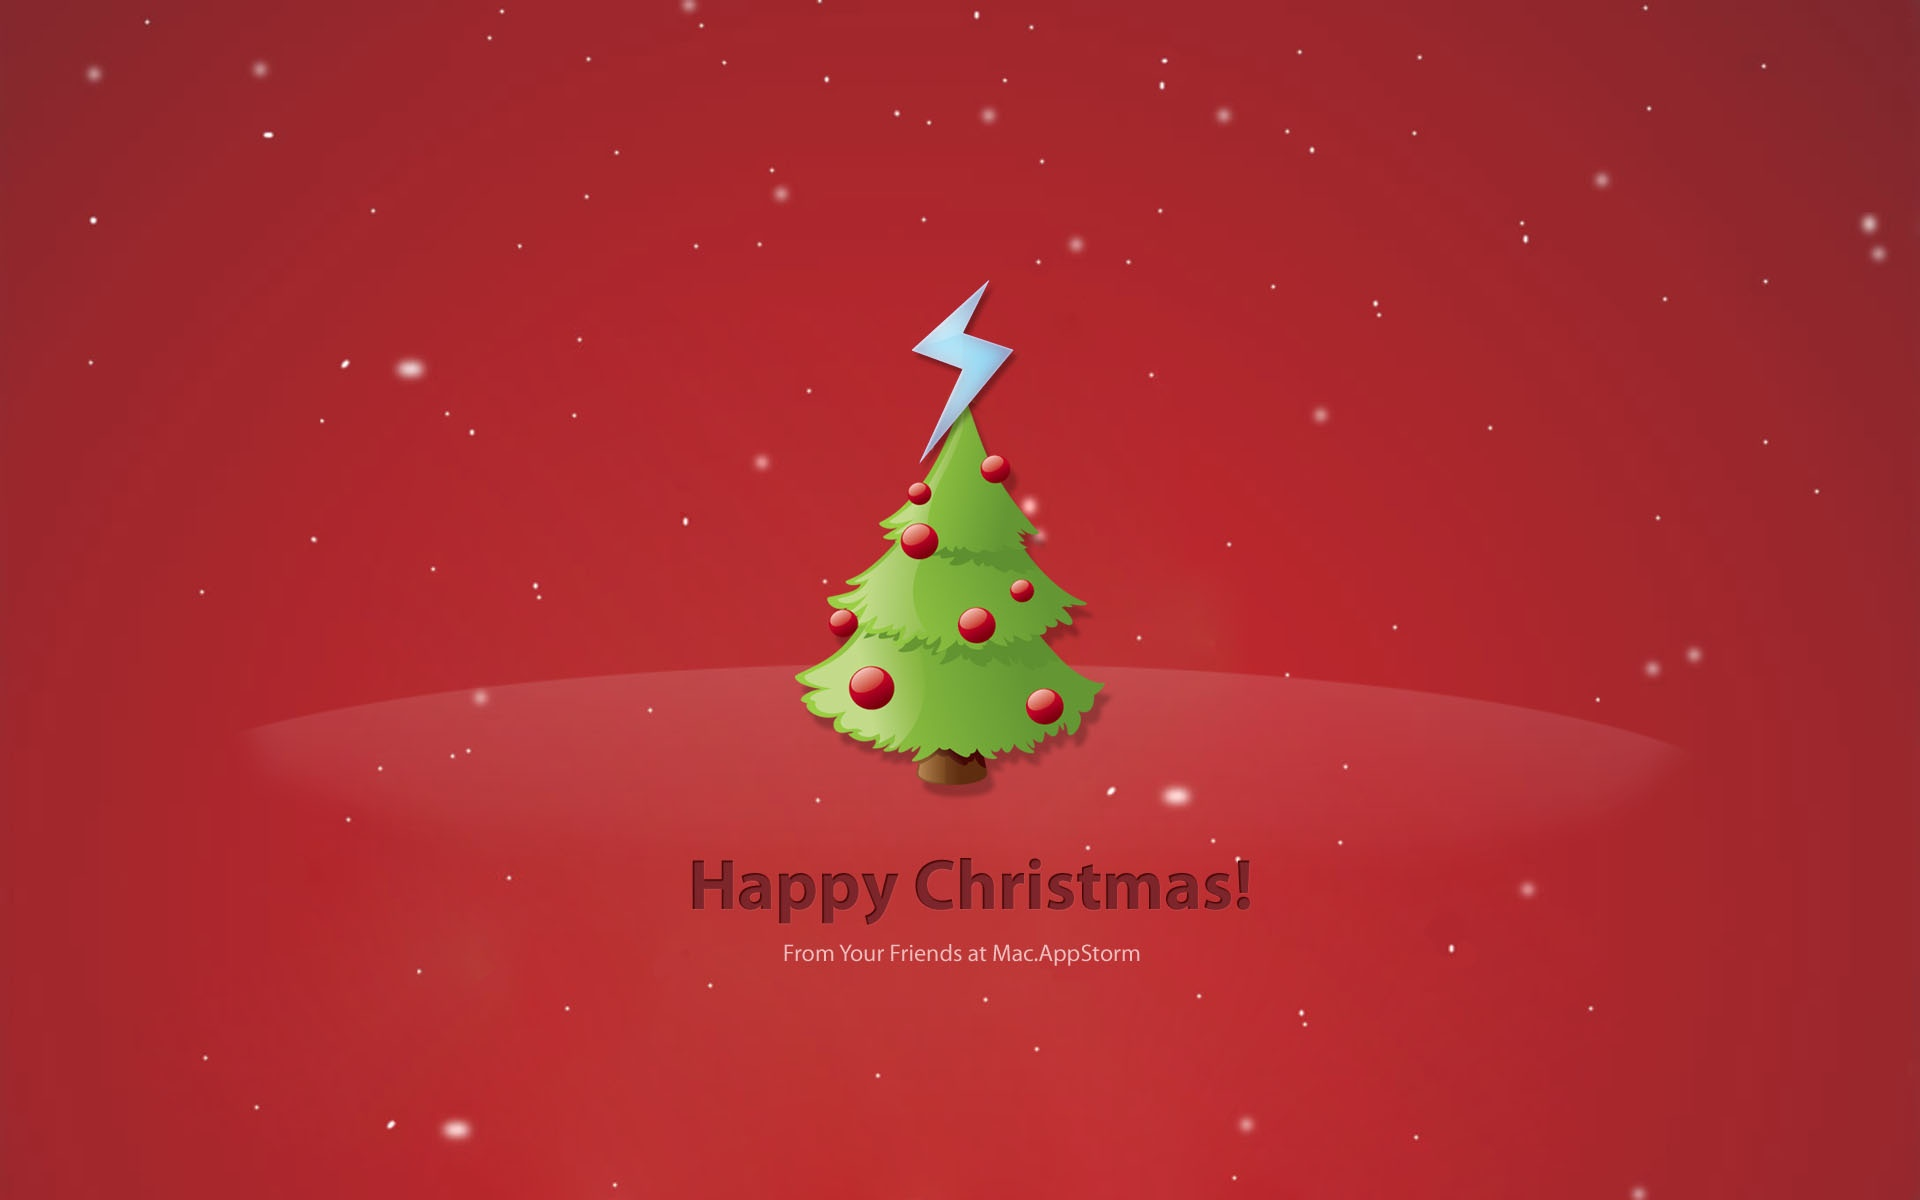 Wallpaper para Navidad 2014 fondo rojo - 1920x1200